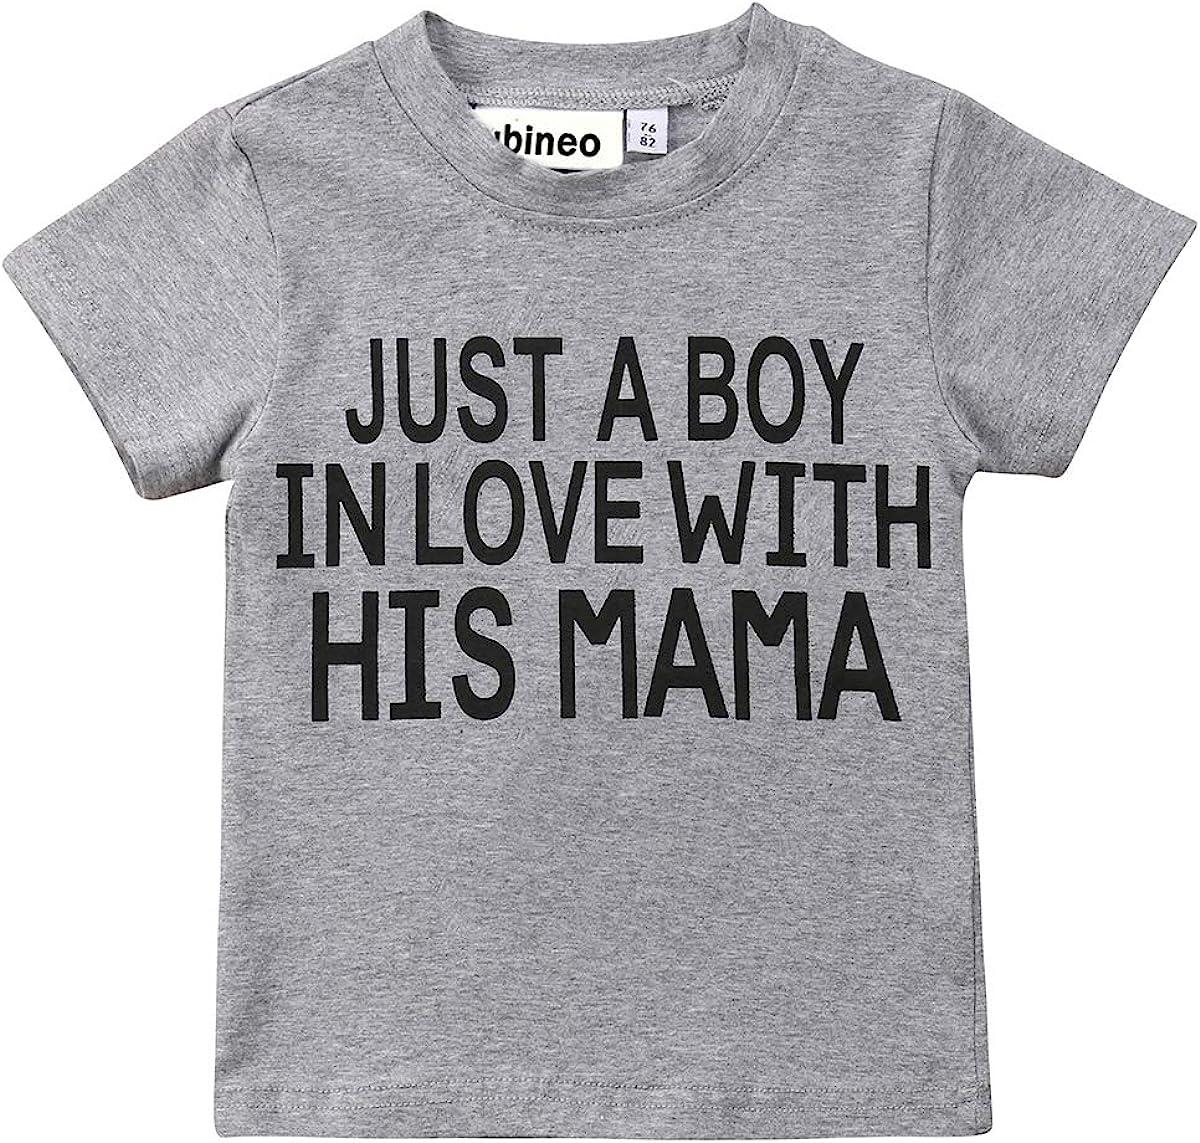 Mubineo Toddler Baby Girl Boy Funny Short Sleeve Cotton T Shirts Tops Tee Clothe